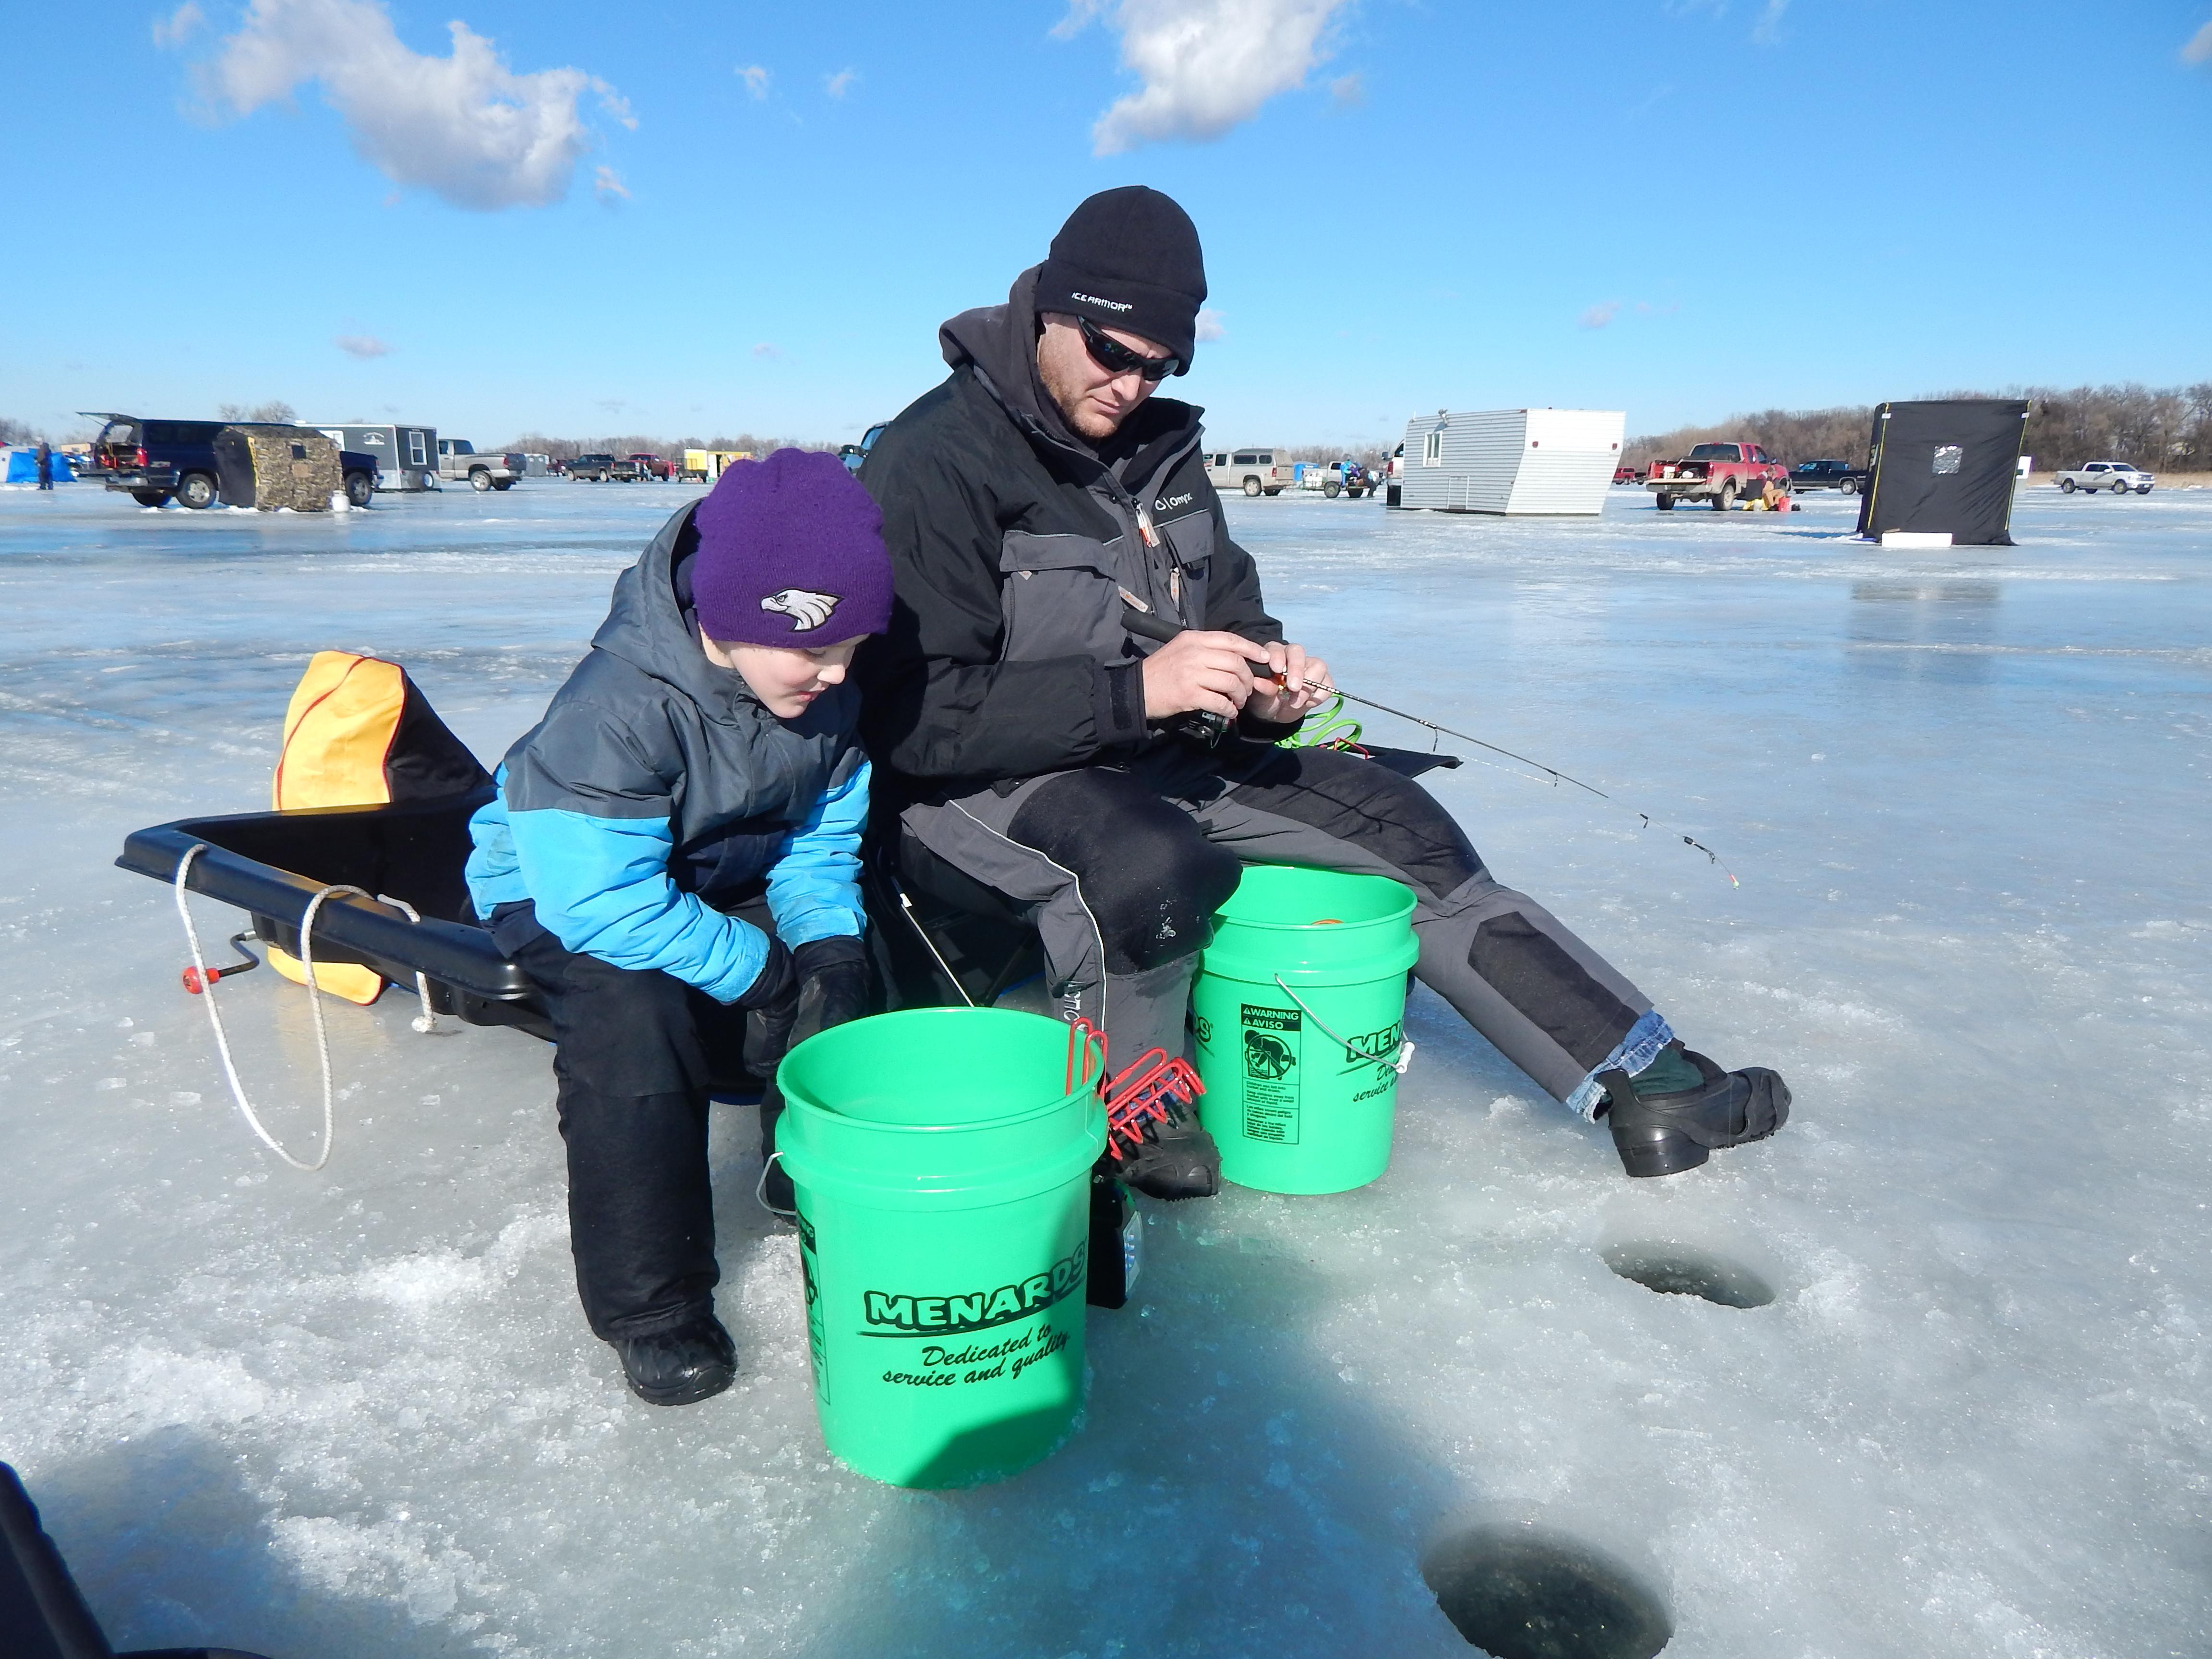 Ice Fishing Car Accident Feb